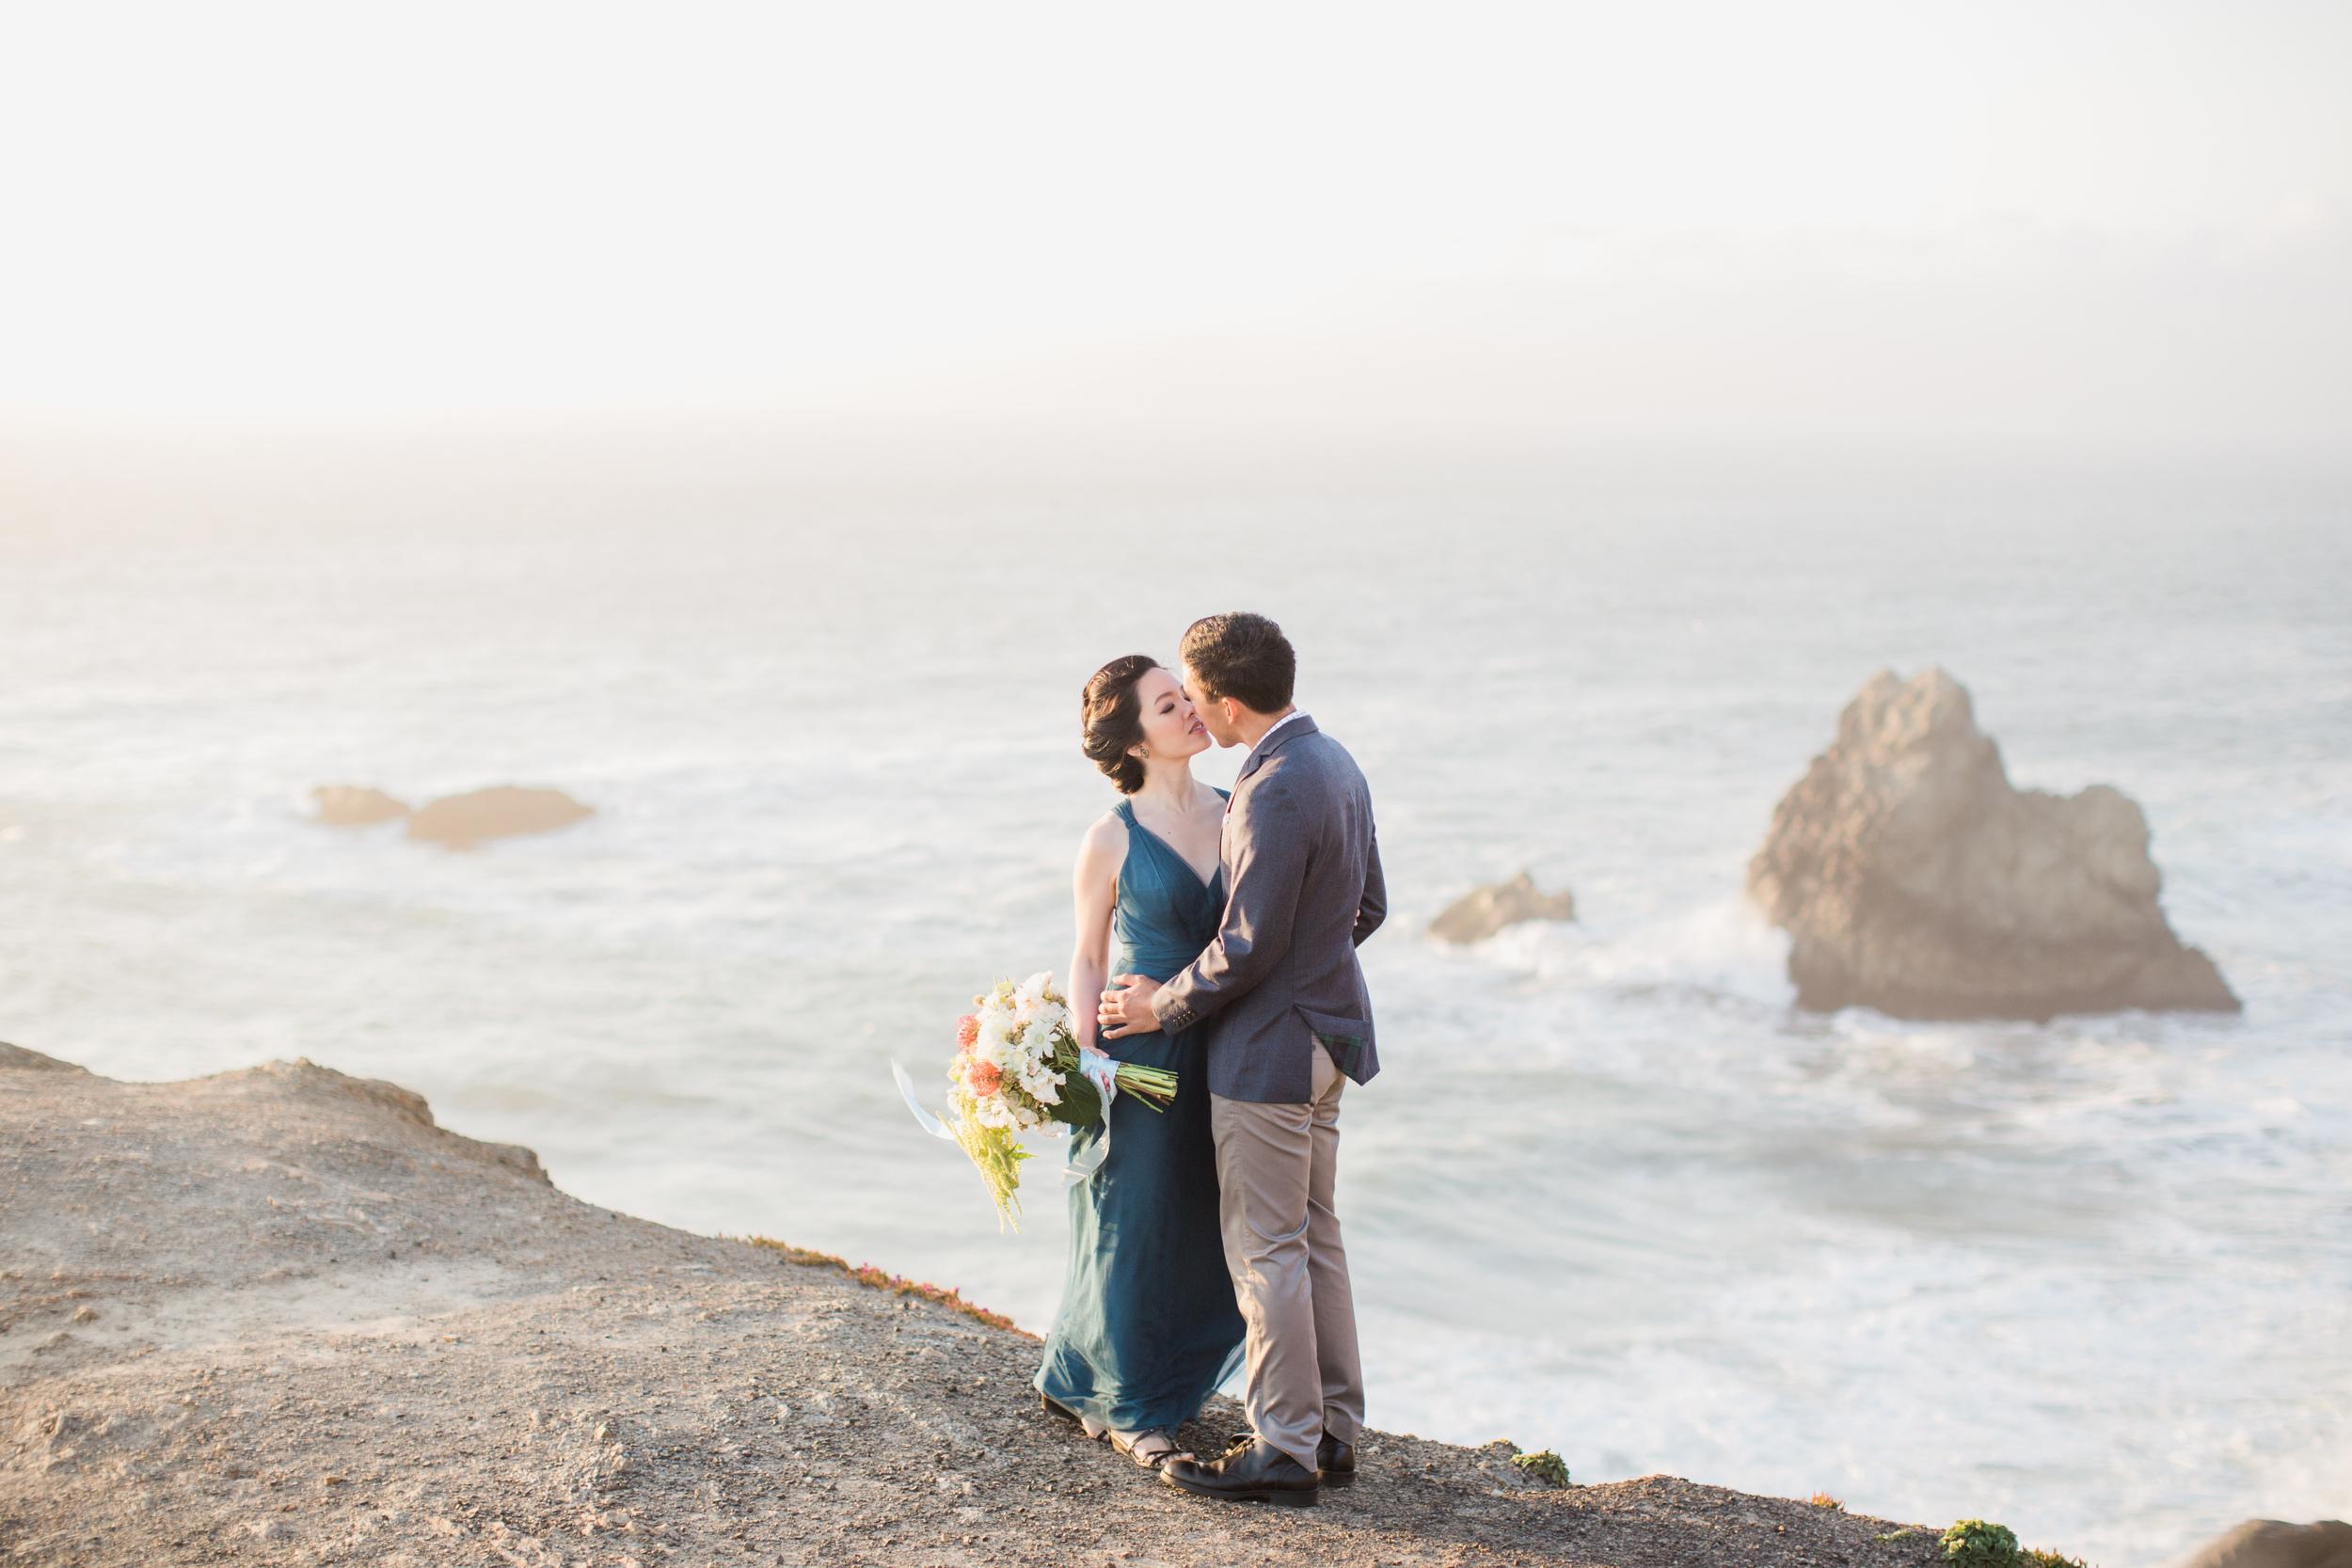 San-Francisco-engagement-1-4.jpg